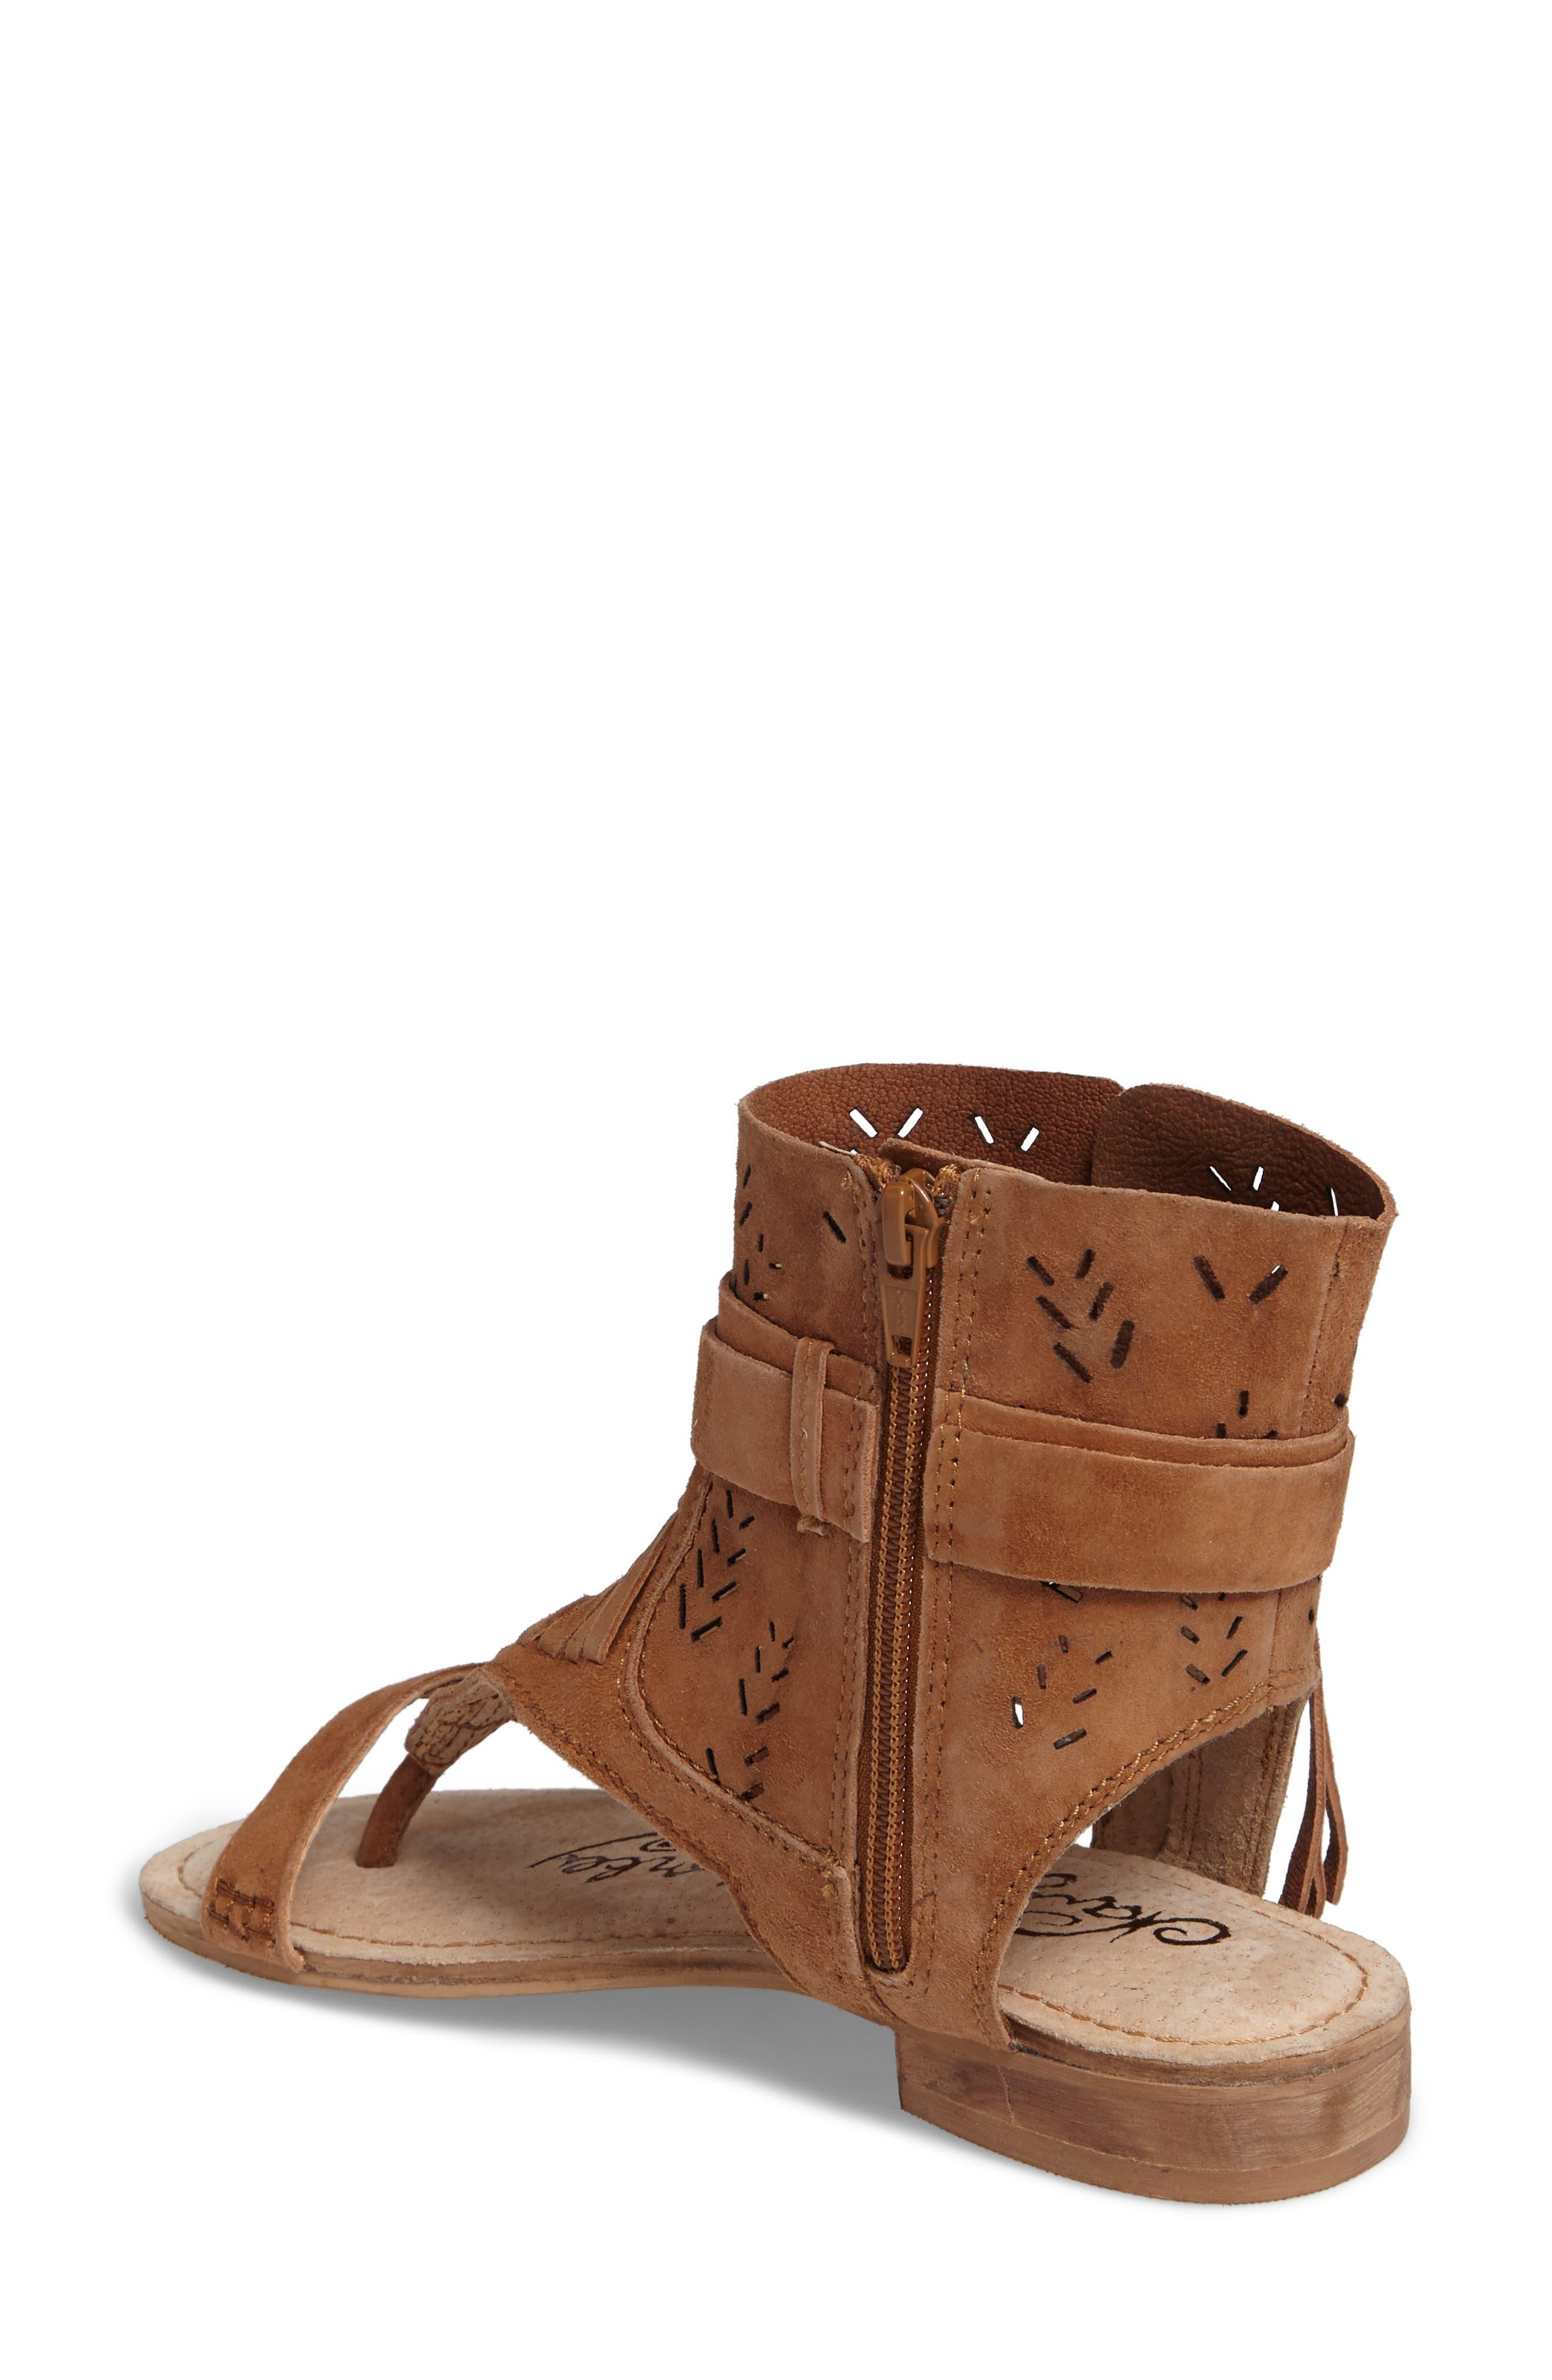 Cochise Flat Sandal,                             Alternate thumbnail 8, color,